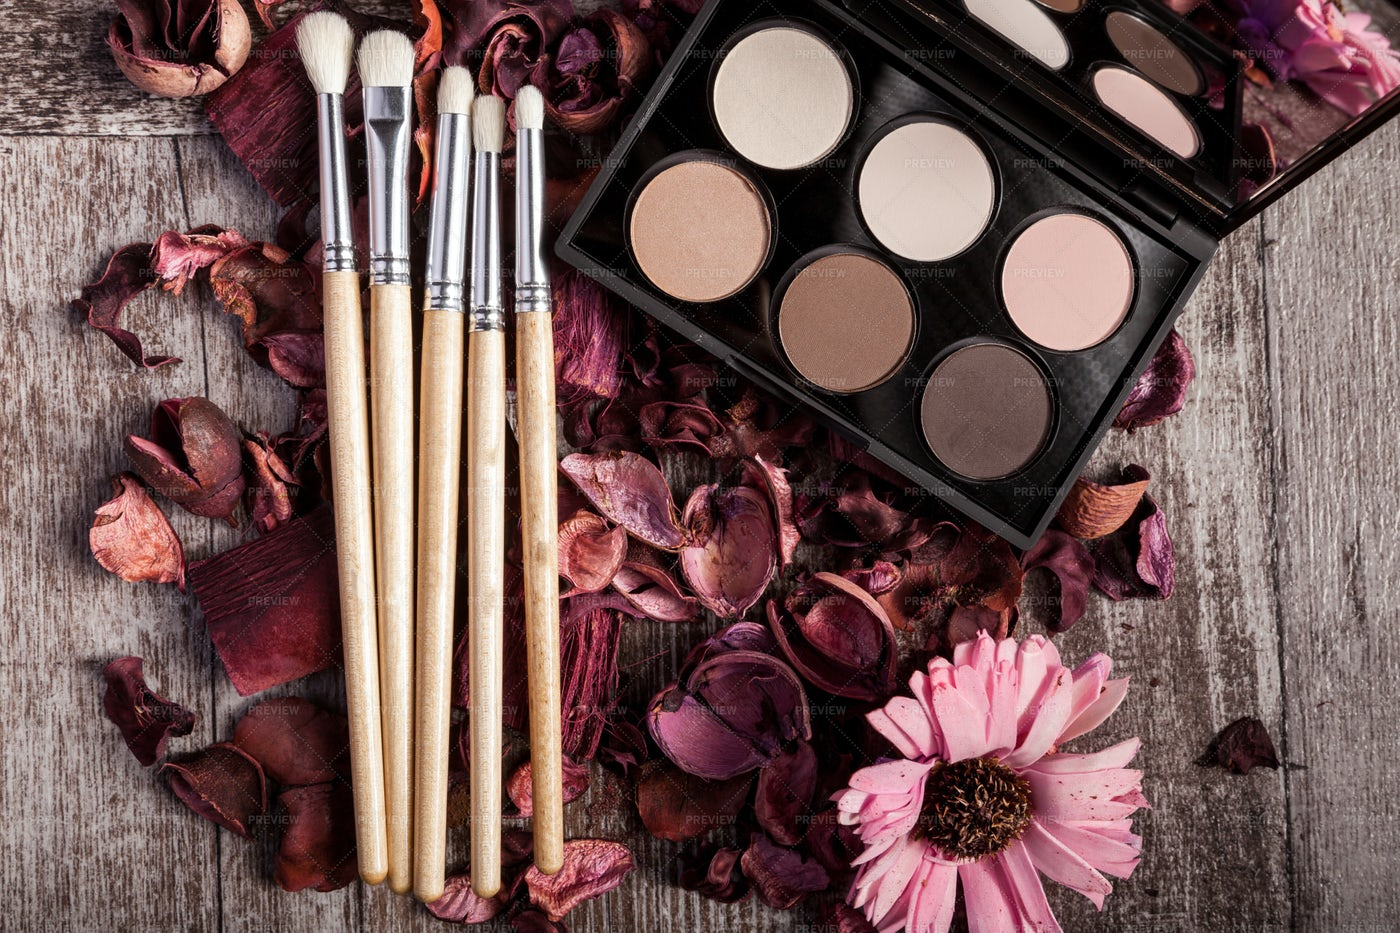 Eyeshadow And Makeup Brushes: Stock Photos